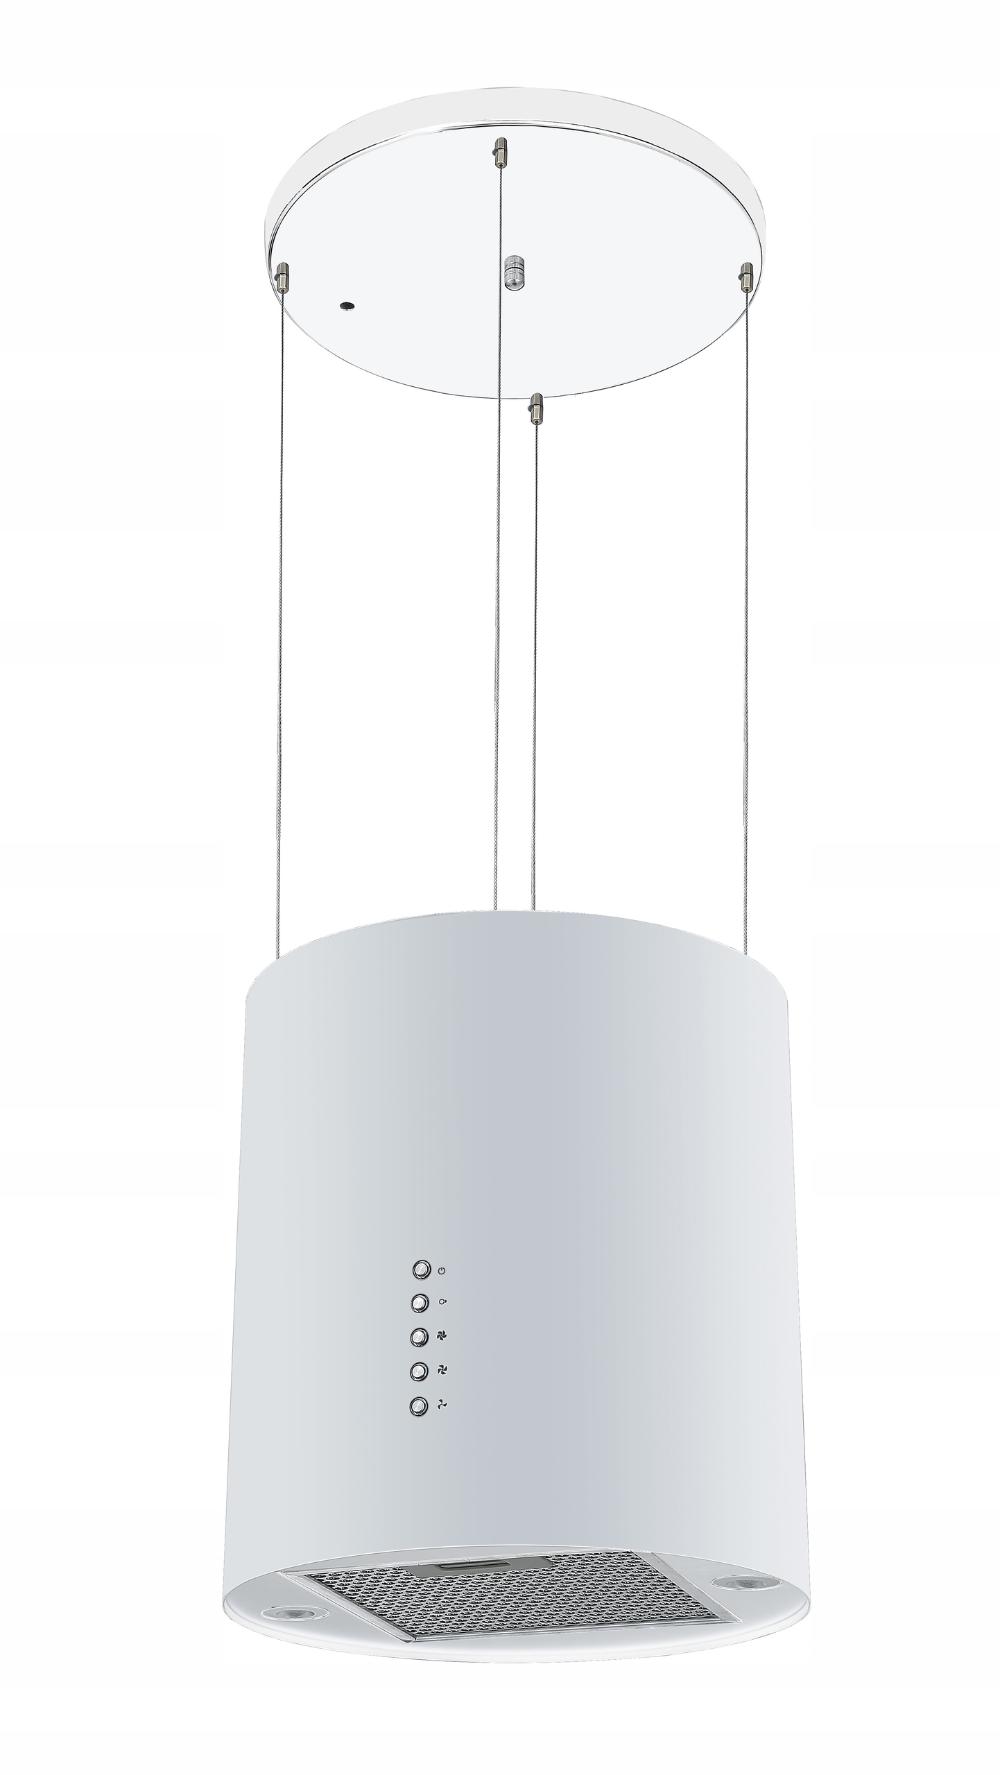 Okap Wyspowy Tango Bialy 8501938751 Allegro Pl Lamp Home Decor Decor